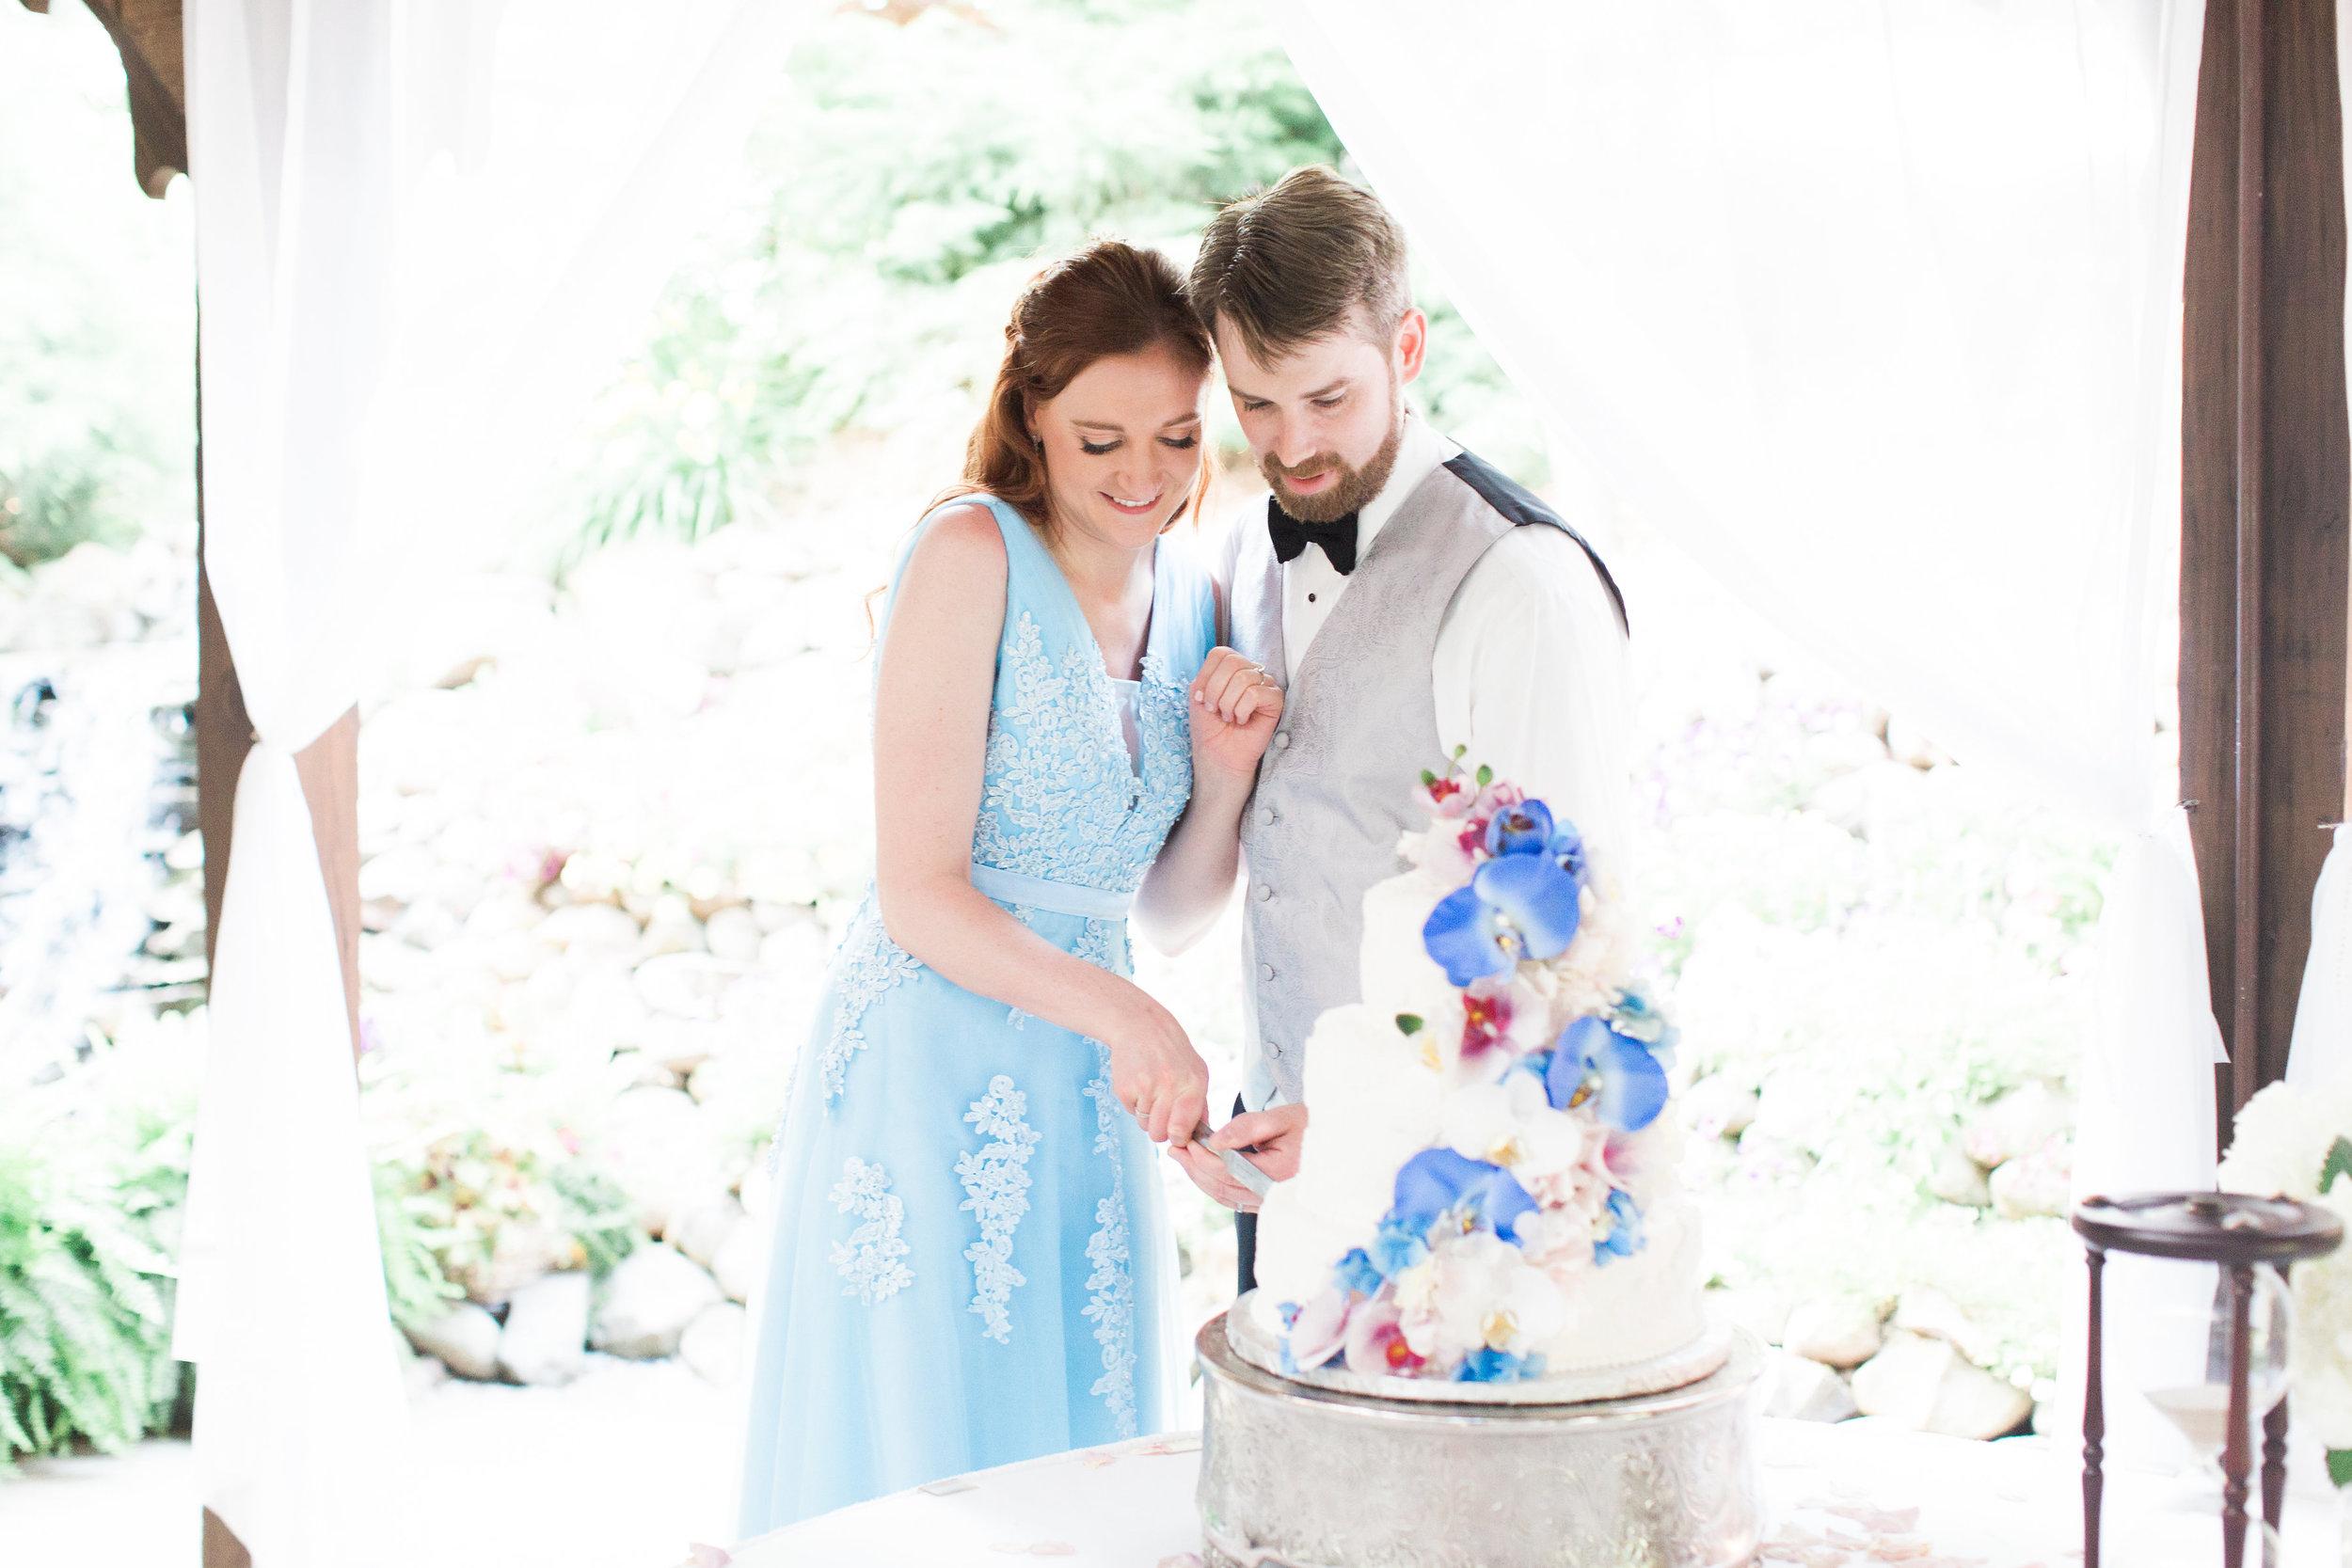 Conger+Wedding+Receptionb-60.jpg